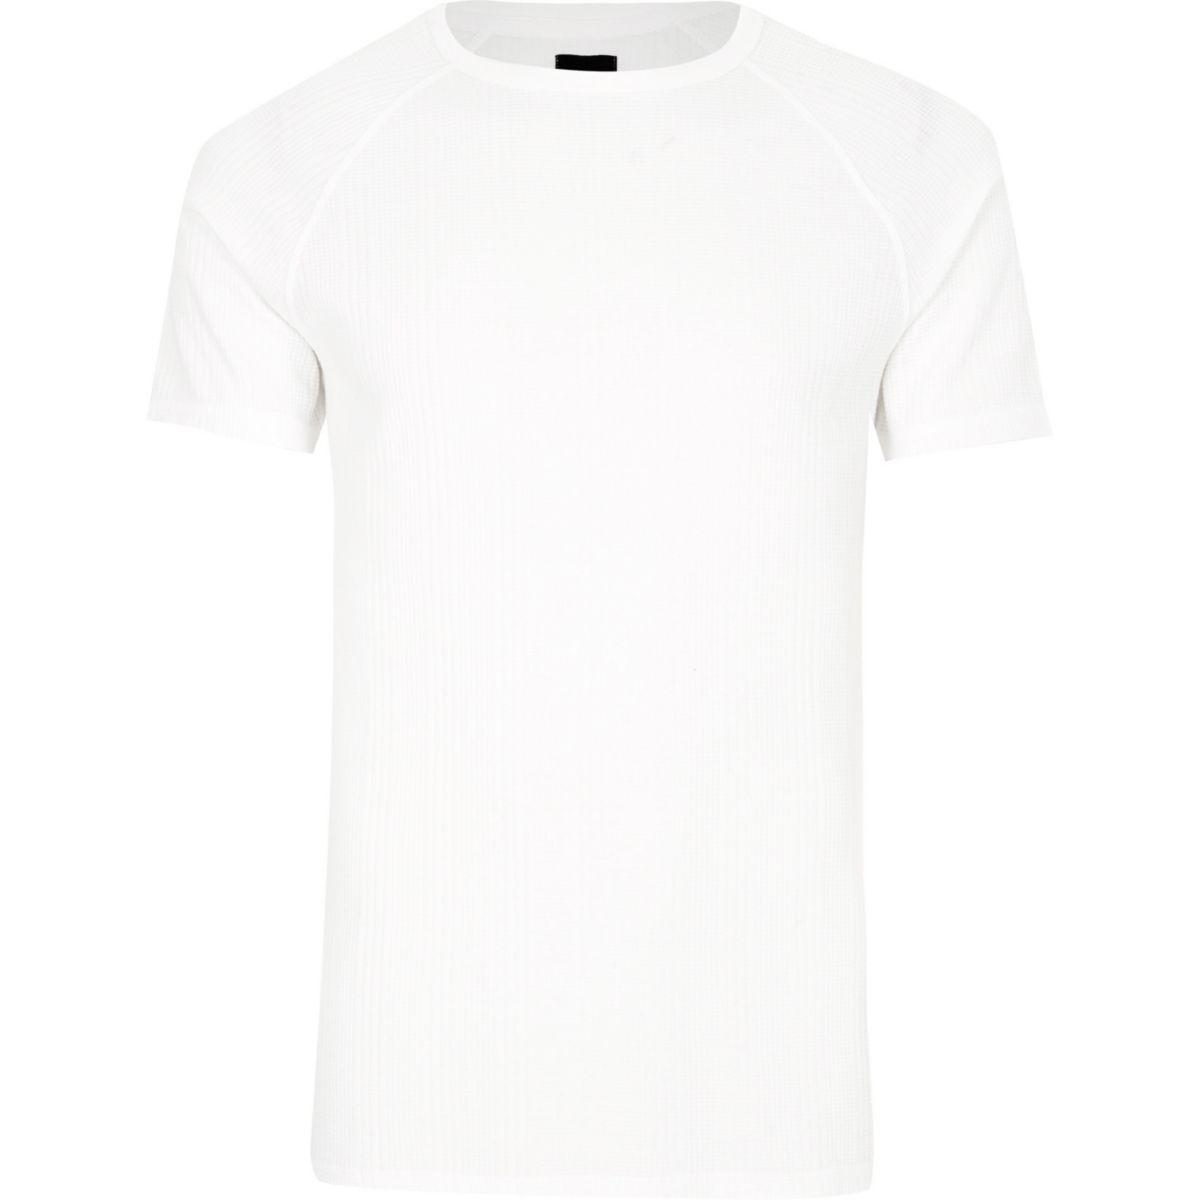 White jacquard short sleeve slim fit t shirt t shirts for Slim fit white t shirt